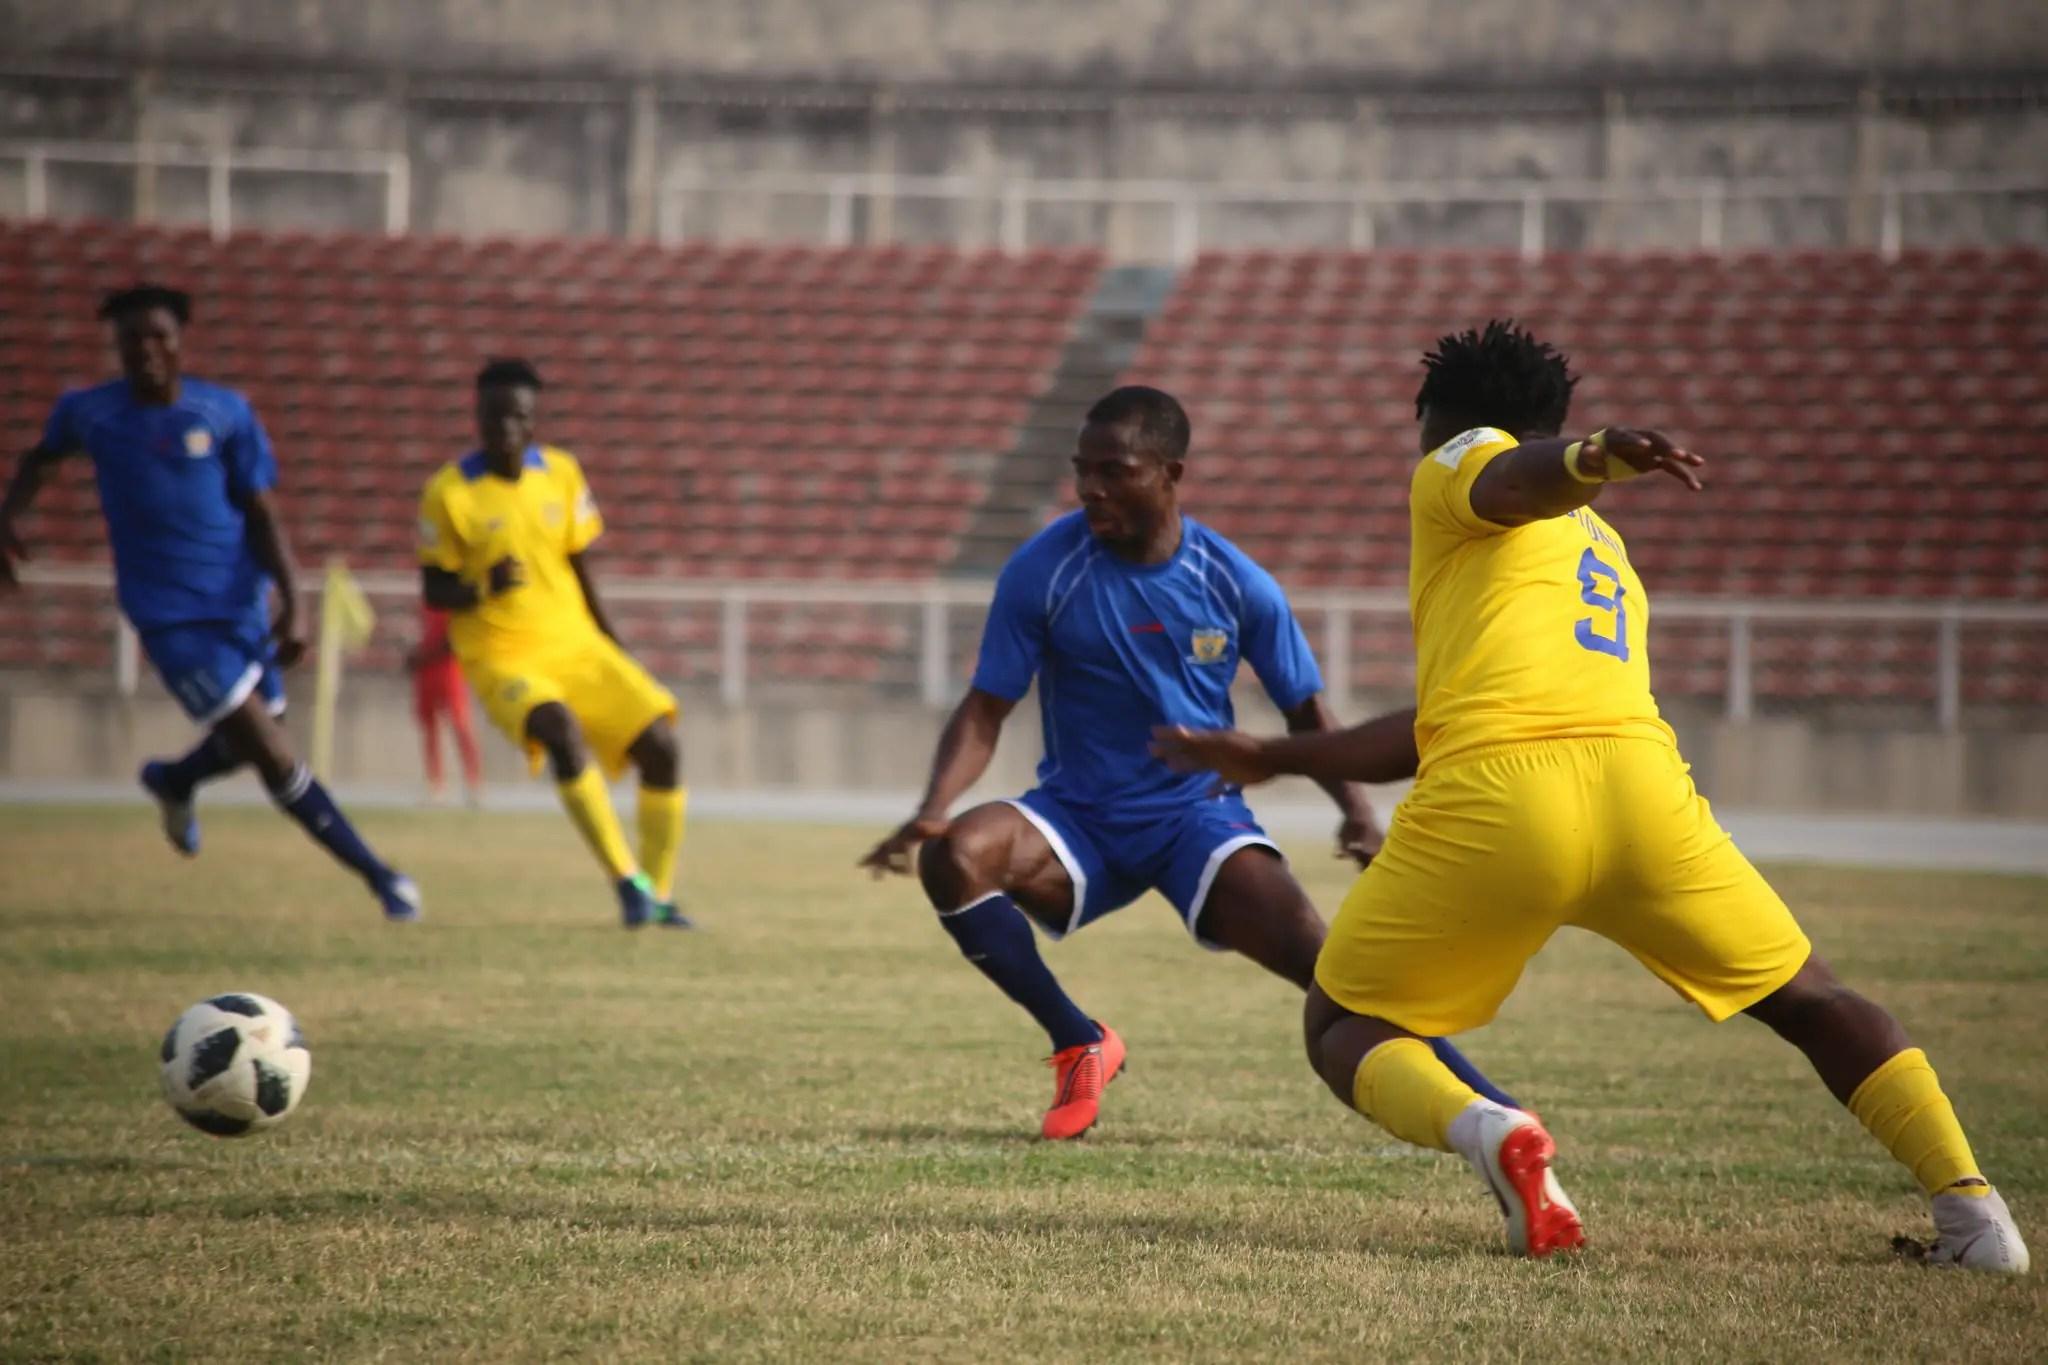 NPFL: Kwara United Pip Plateau Away; MFM Stop Warri Wolves